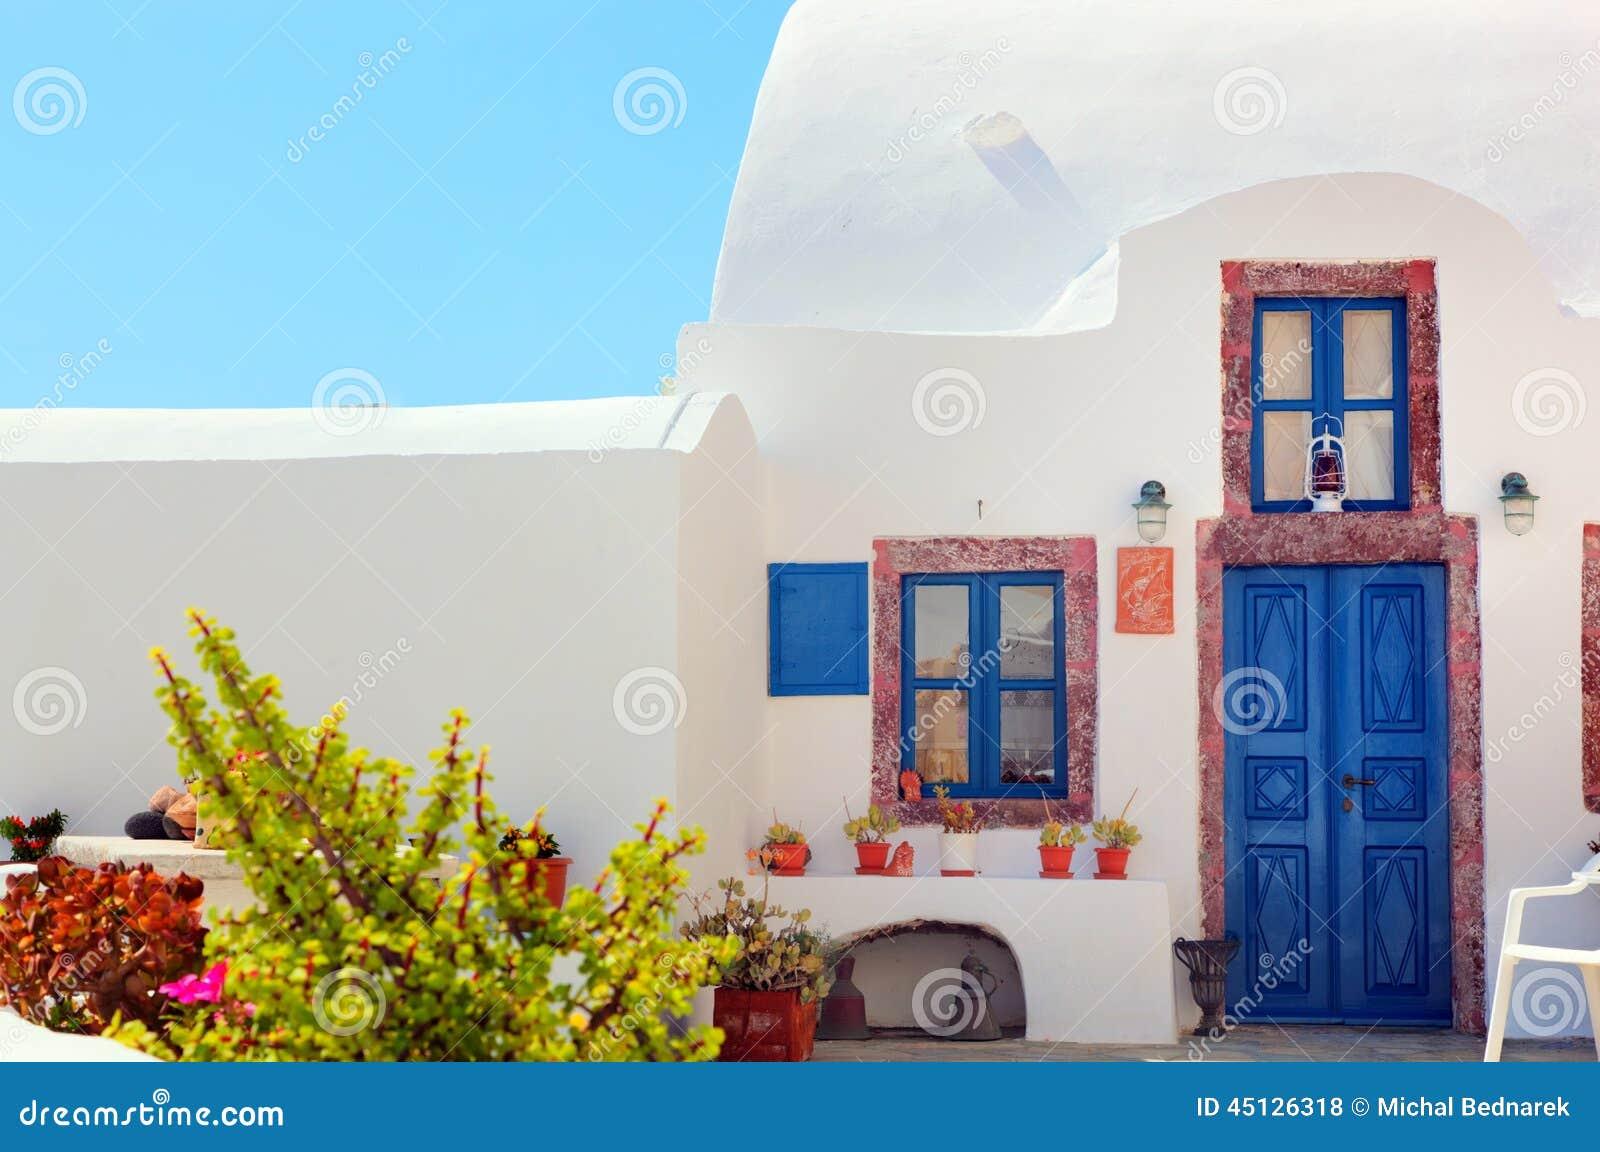 Santorini greece house design